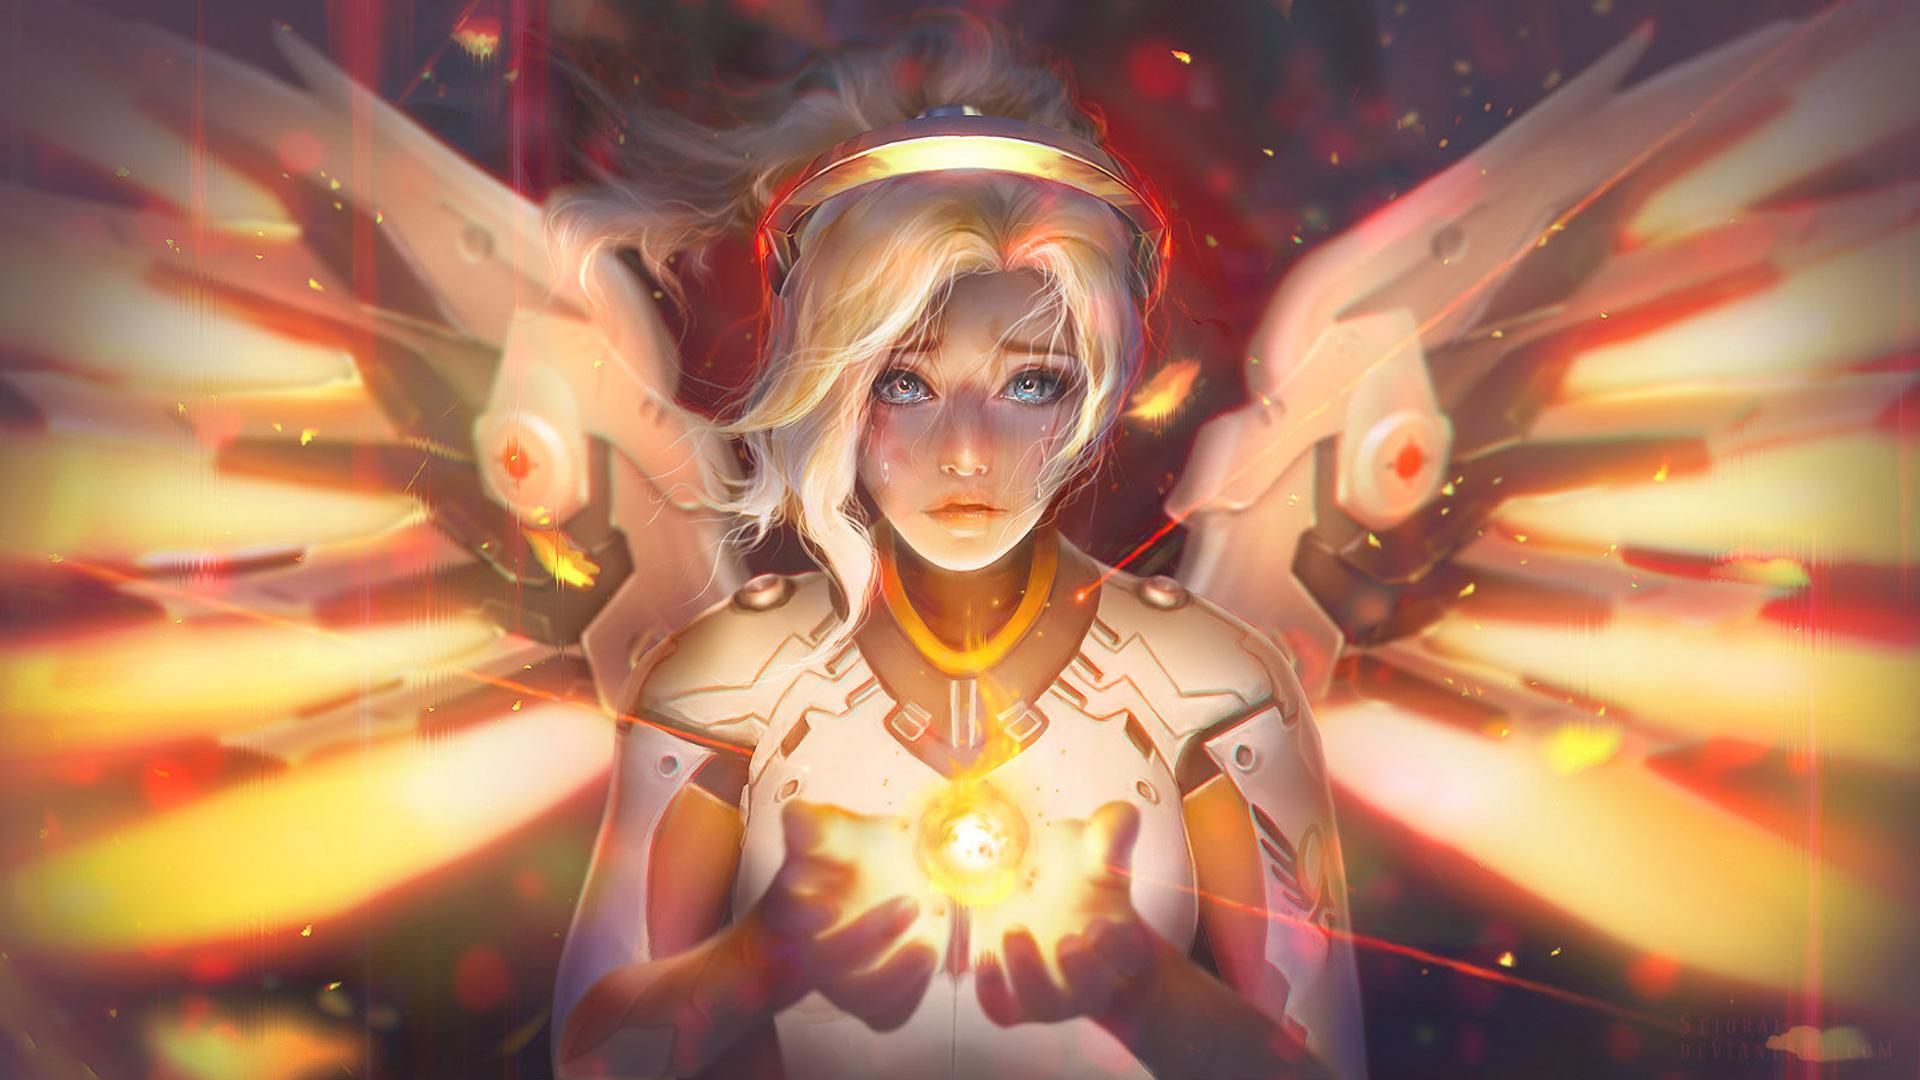 Mercy Angel Overwatch Fantasy, HD Games, 4k Wallpapers ...